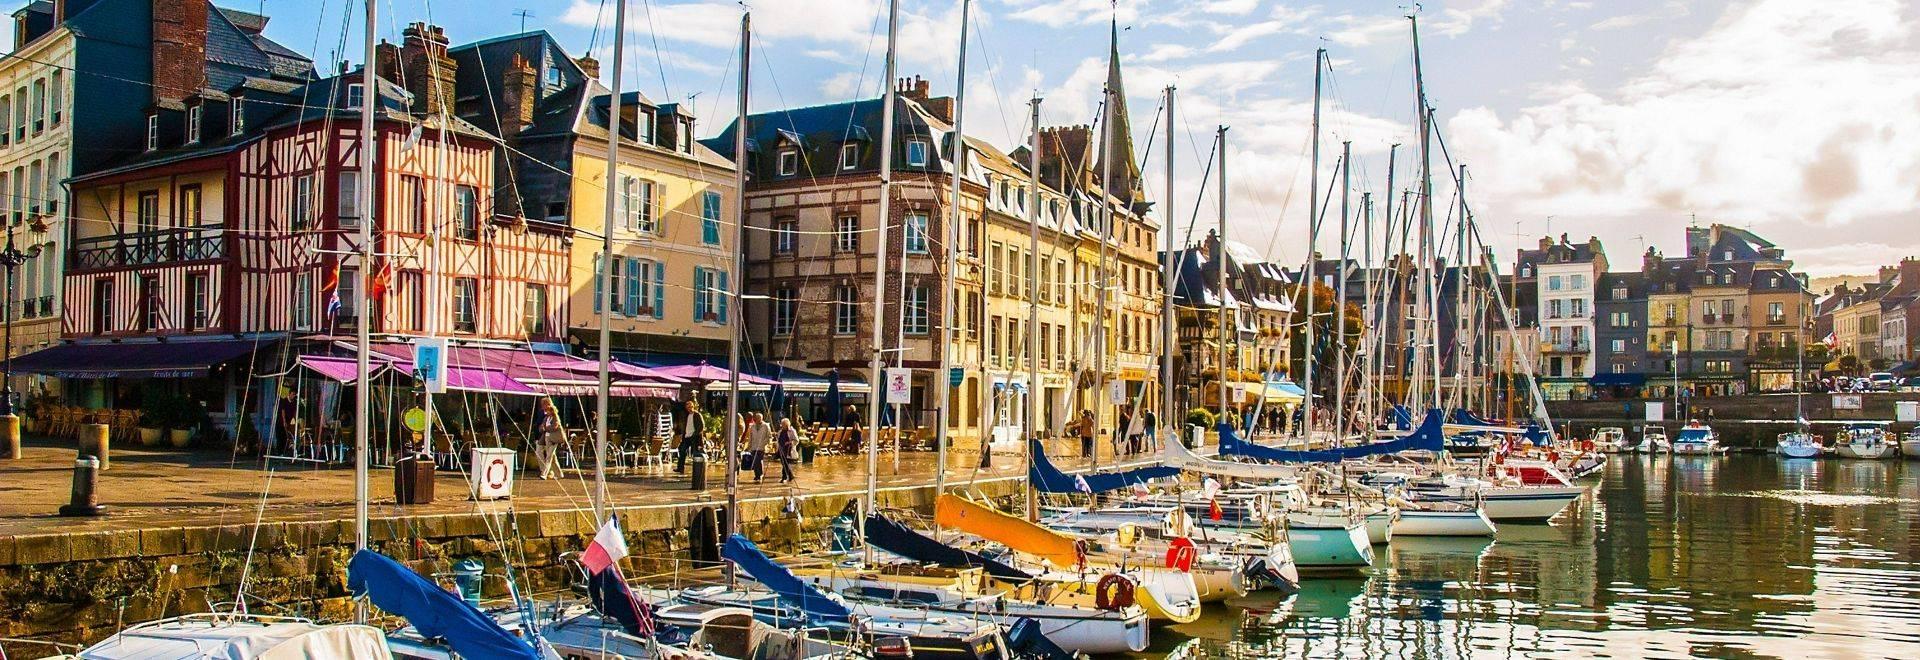 Shutterstock 302111660 Hornfleur, France